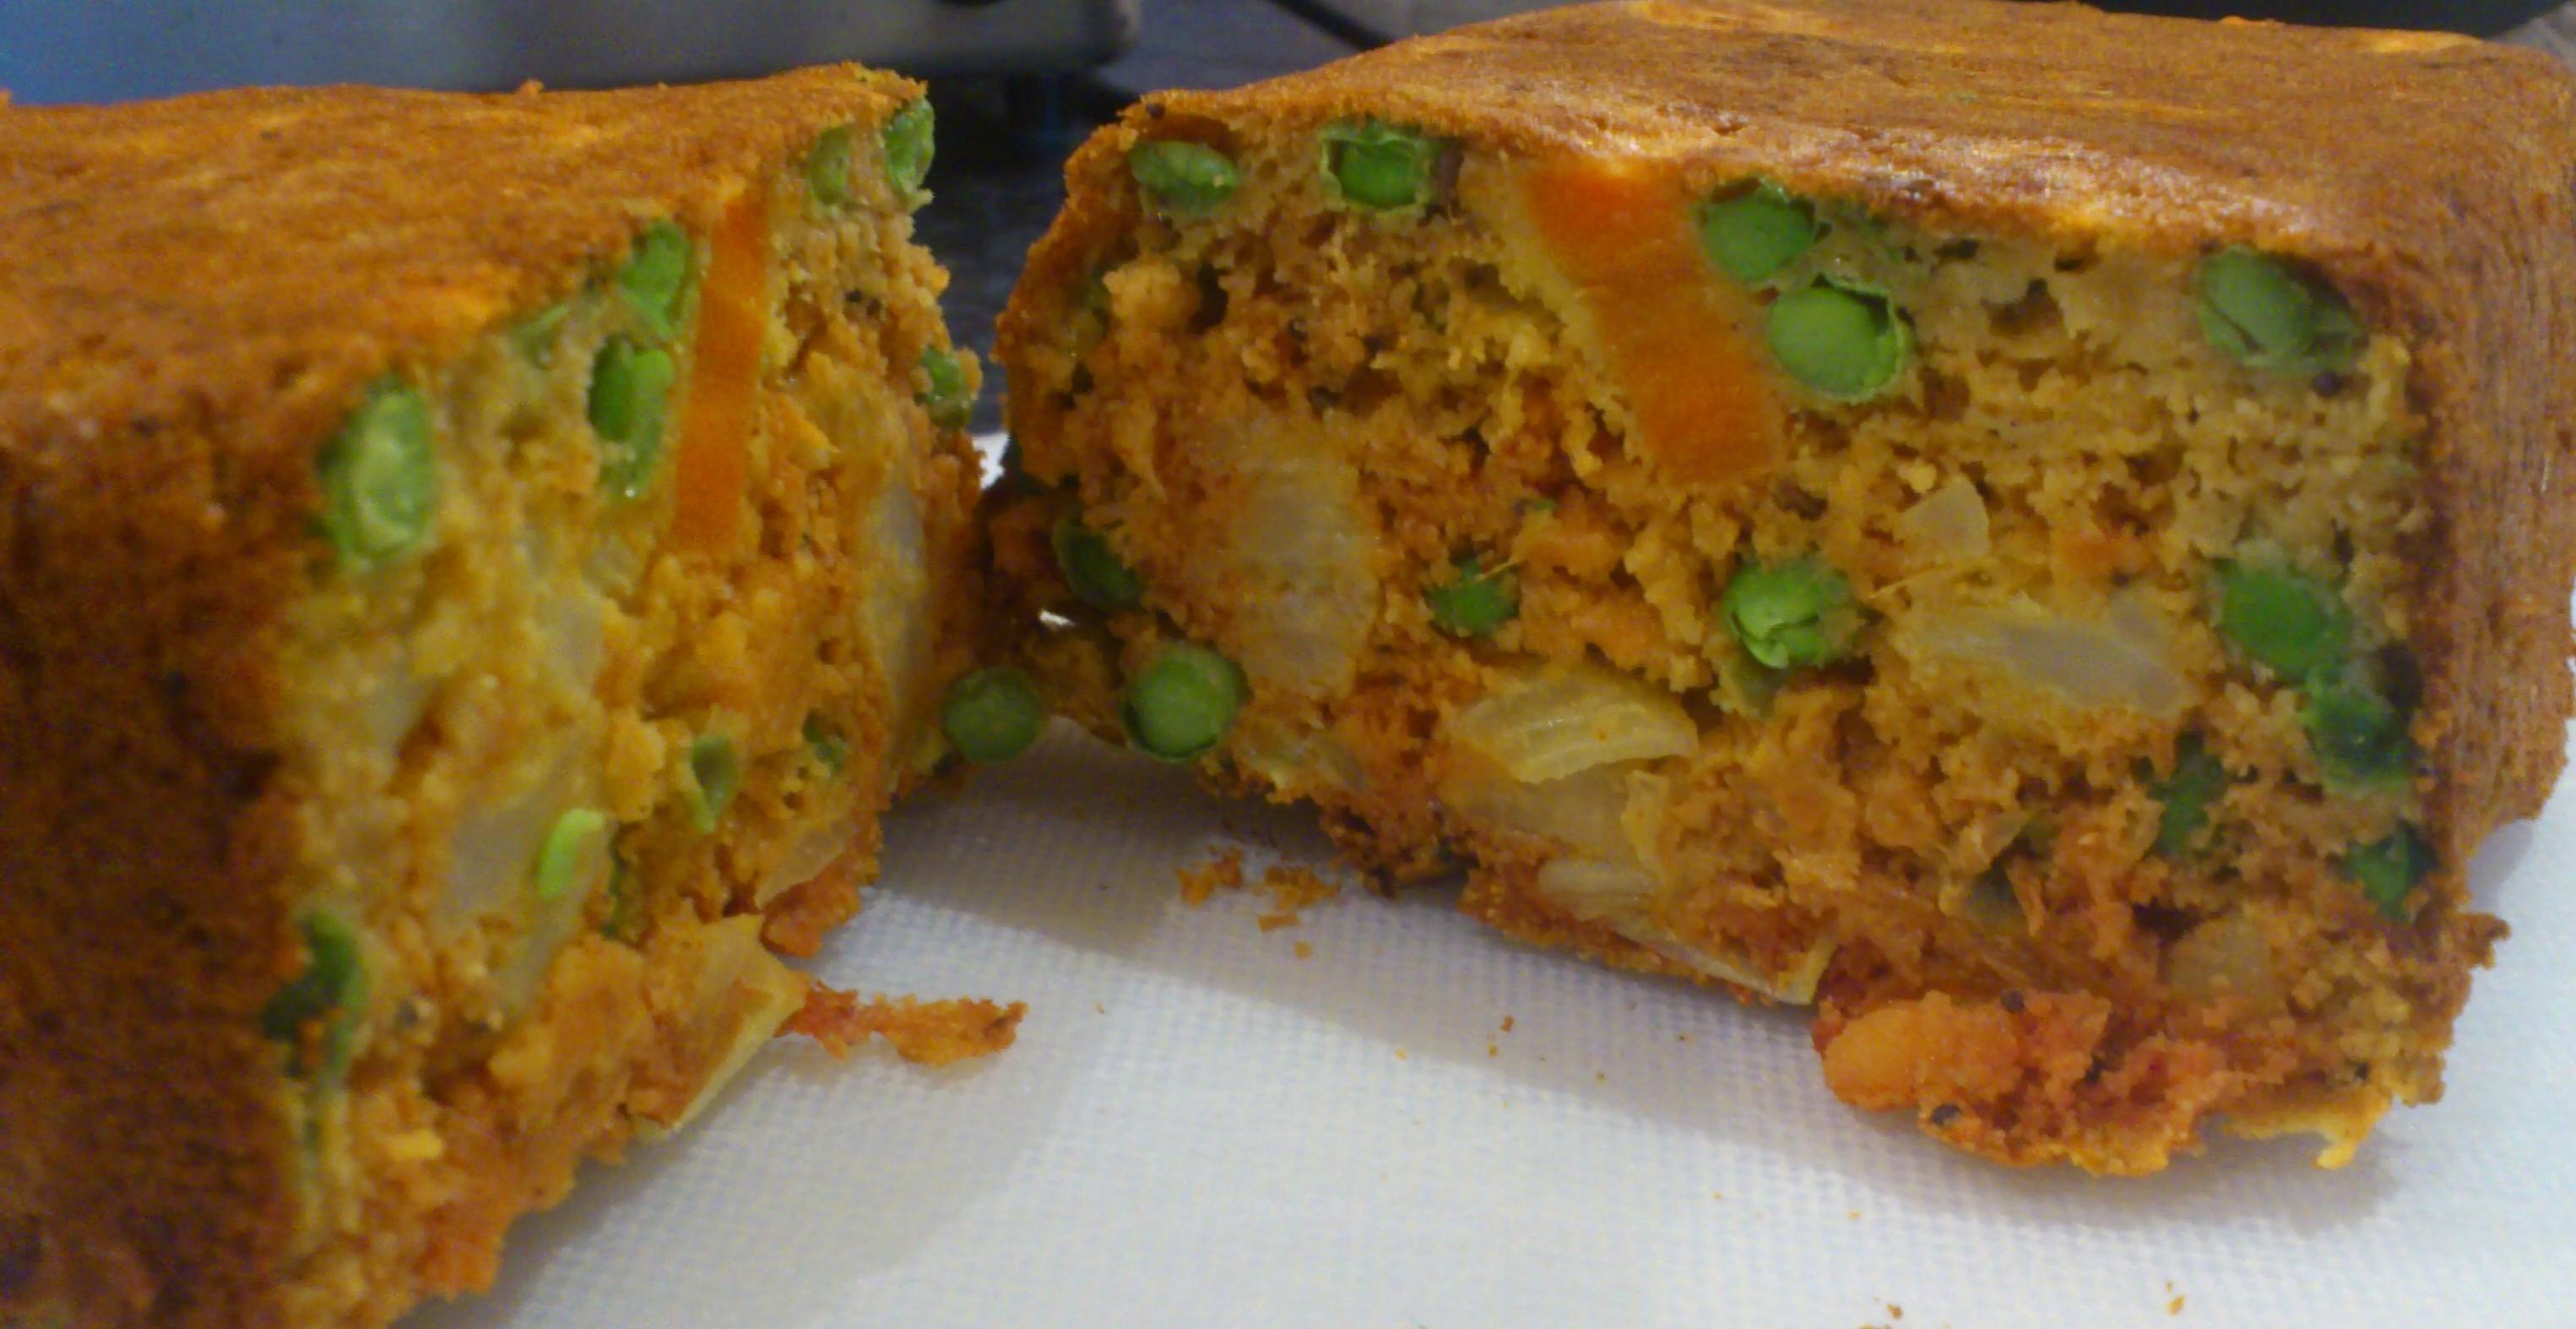 Cake Recipes Using Loaf Tin: Savoury Loaf Tin Recipes